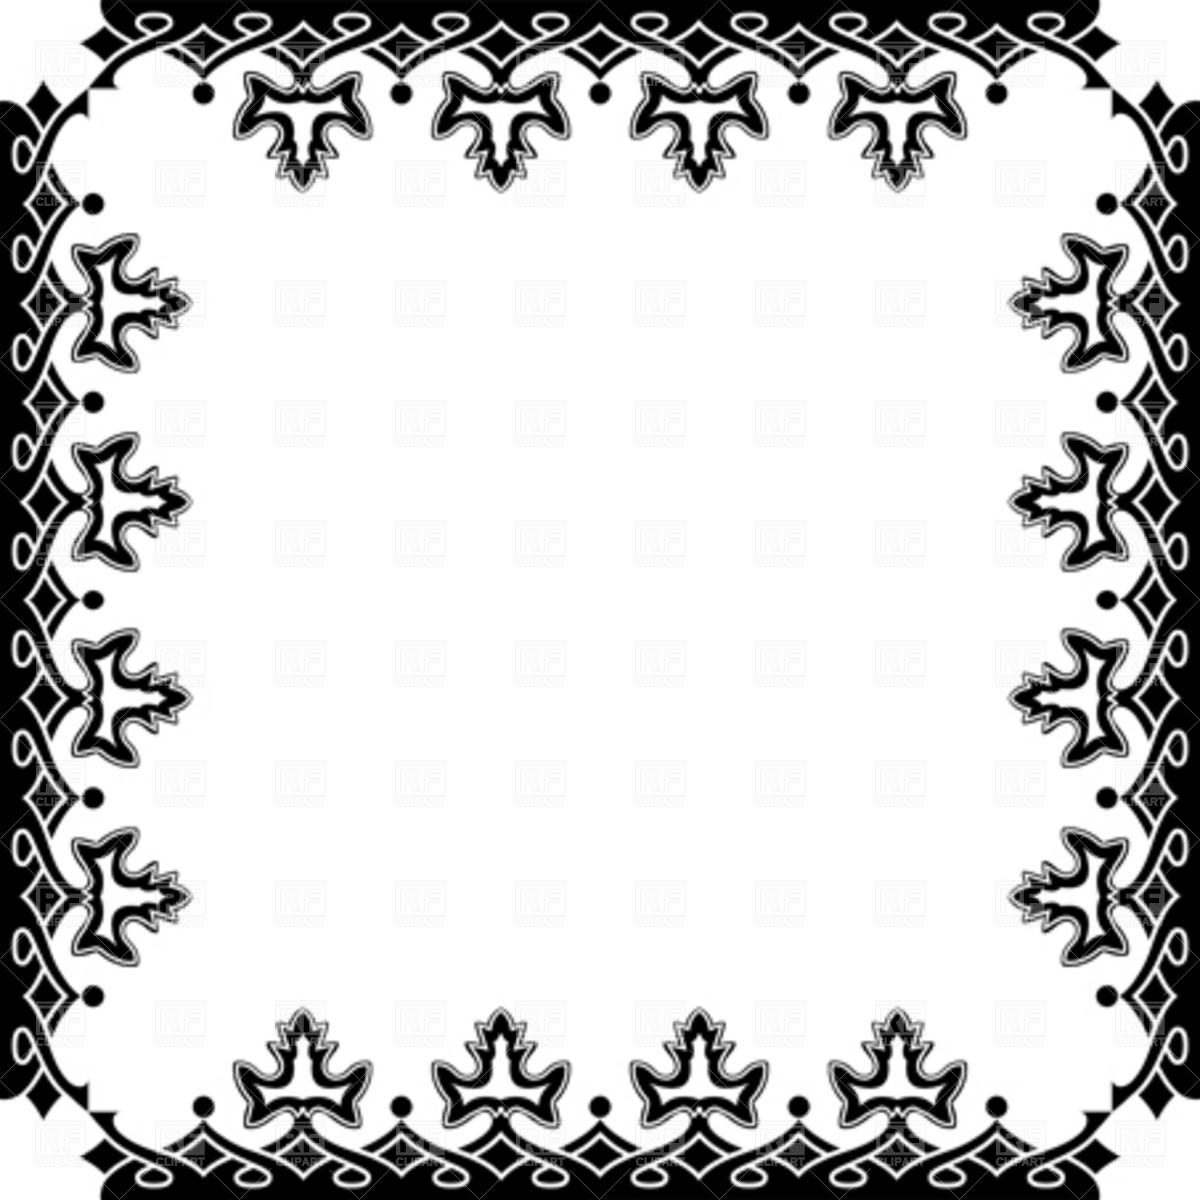 free victorian clip art frames - photo #10